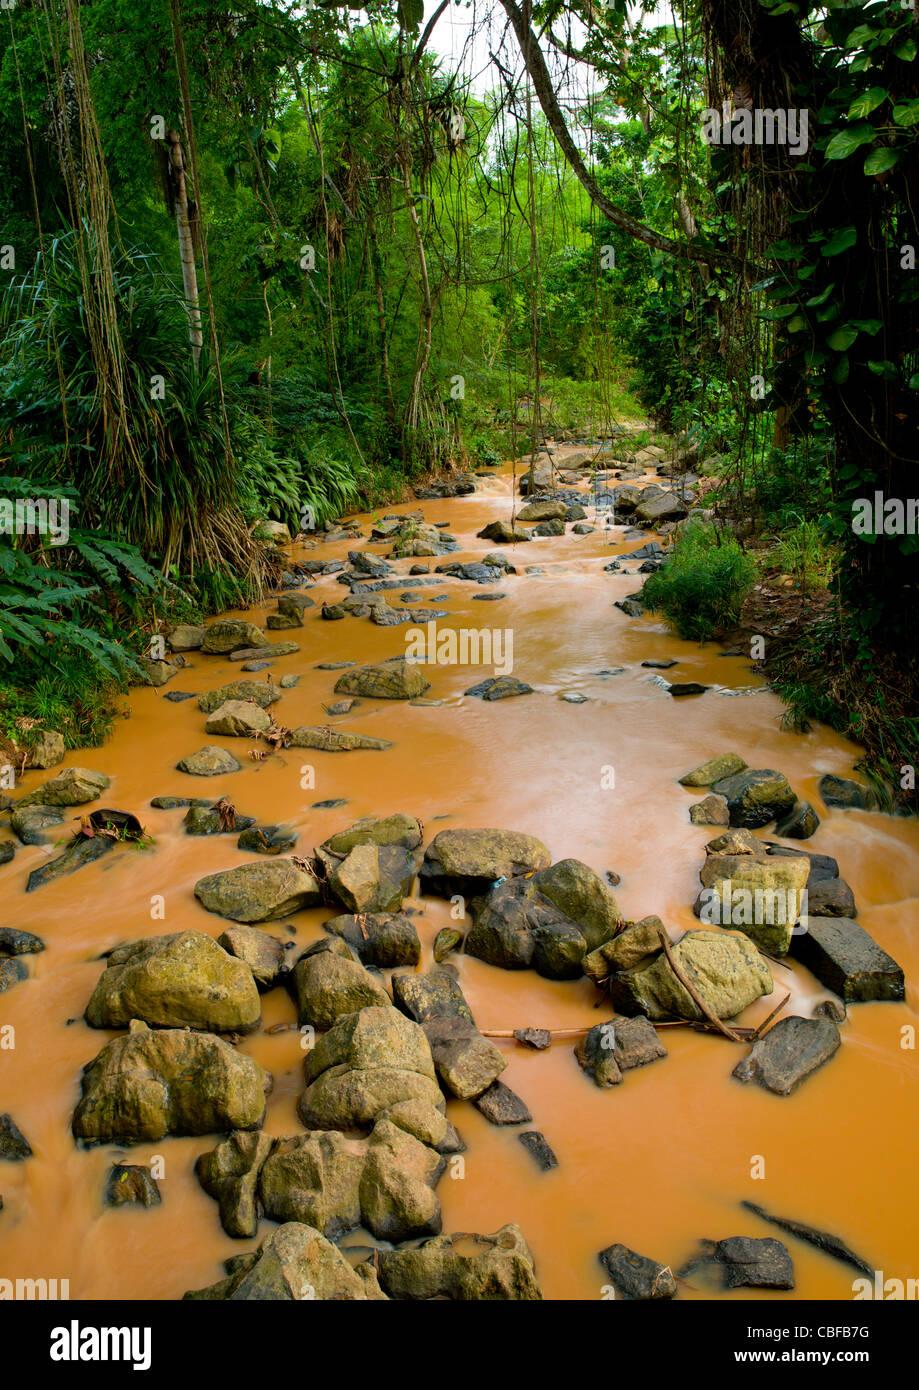 Small Muddy River In N Dalatando Botanical Garden, Angola - Stock Image